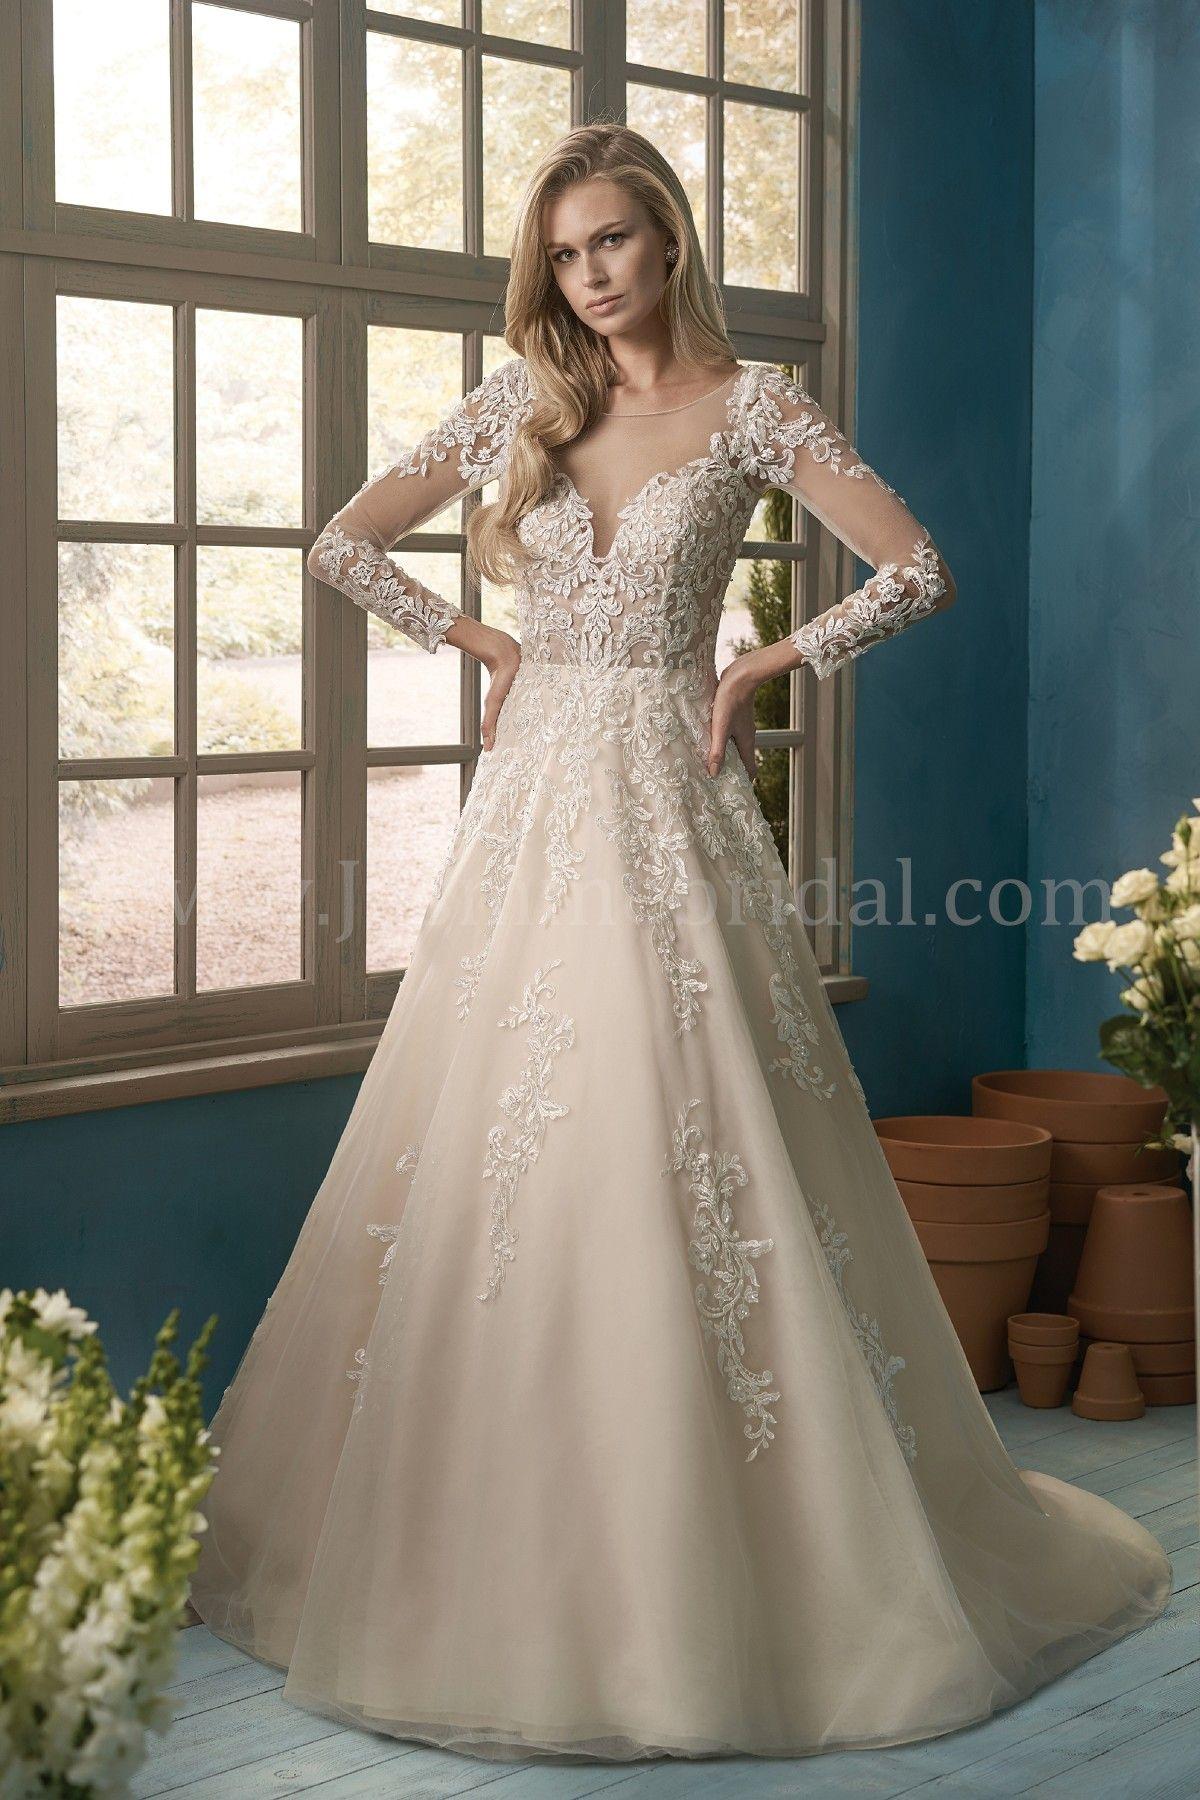 Jasmine collection illusion sleeves long sleeve wedding dress